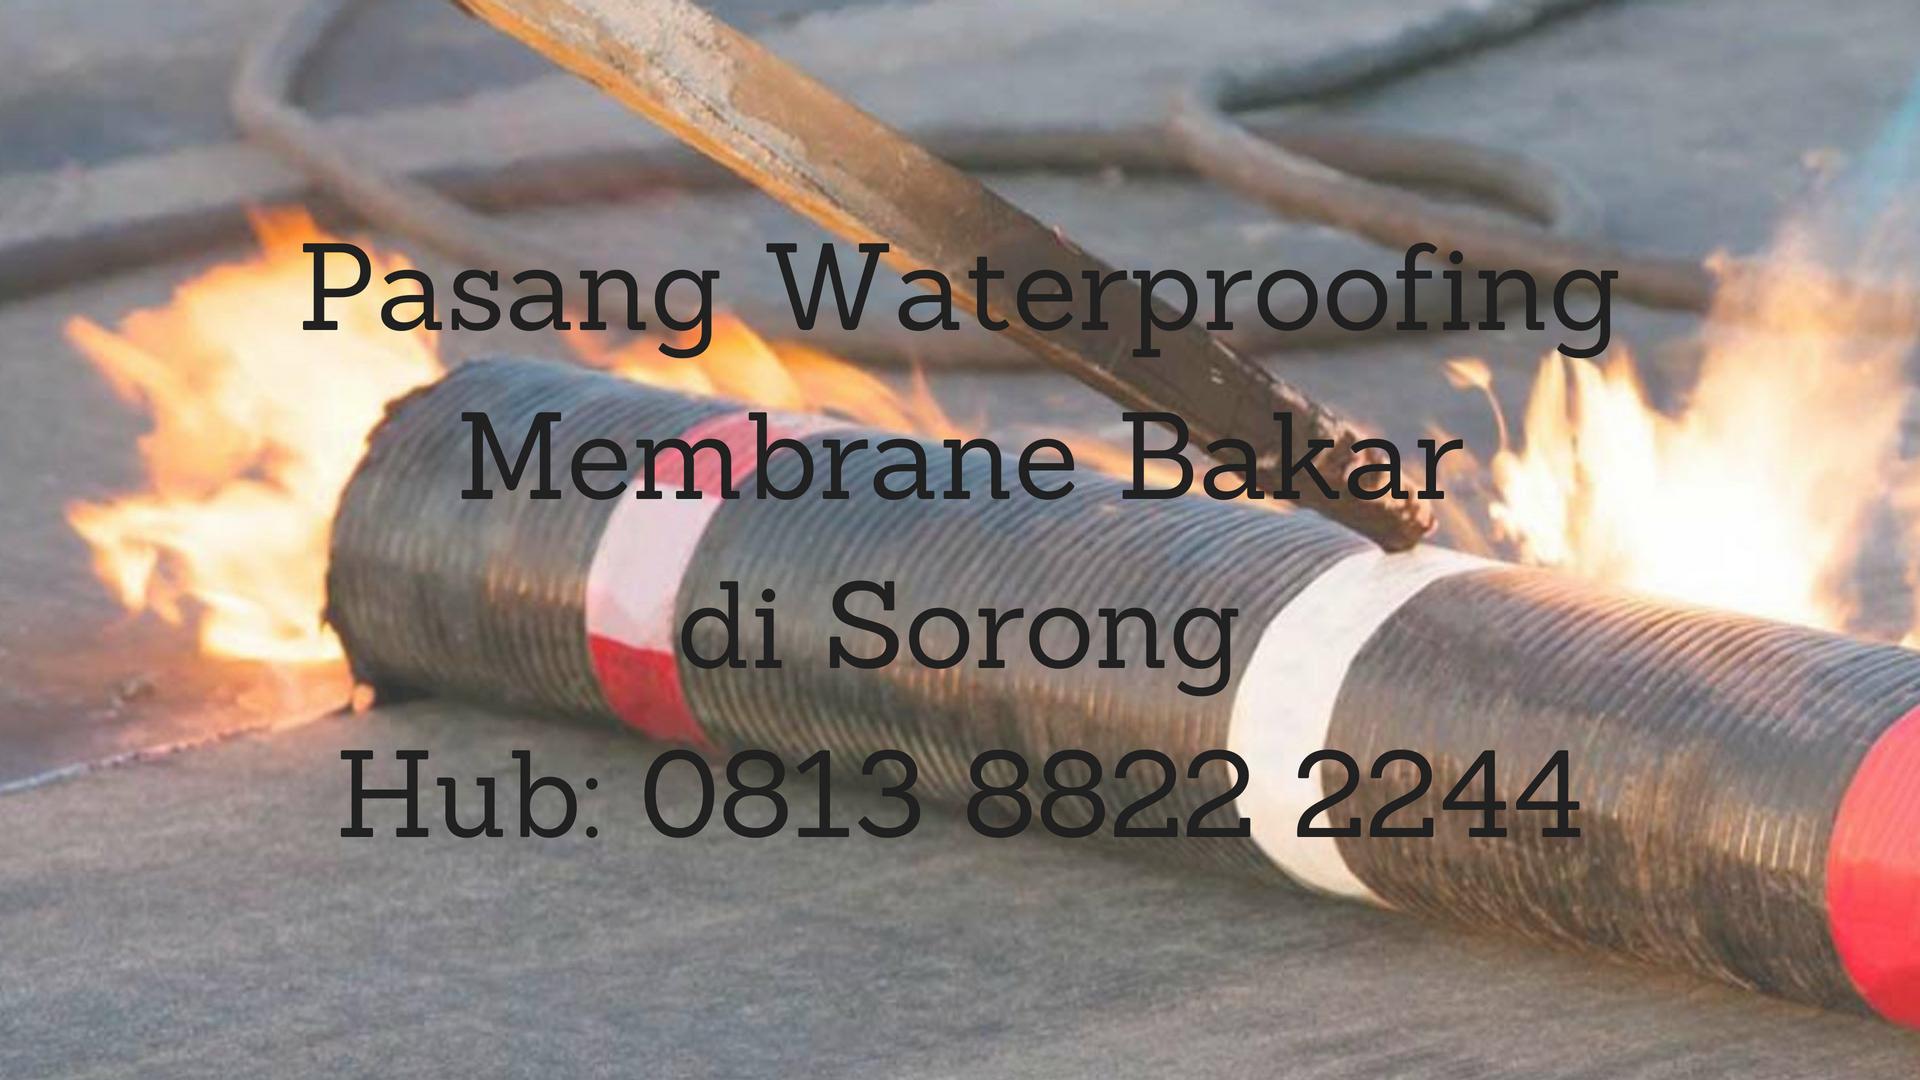 PASANG WATERPROOFING MEMBRANE BAKAR DI SORONG.  HUB : 0813 8822 2244